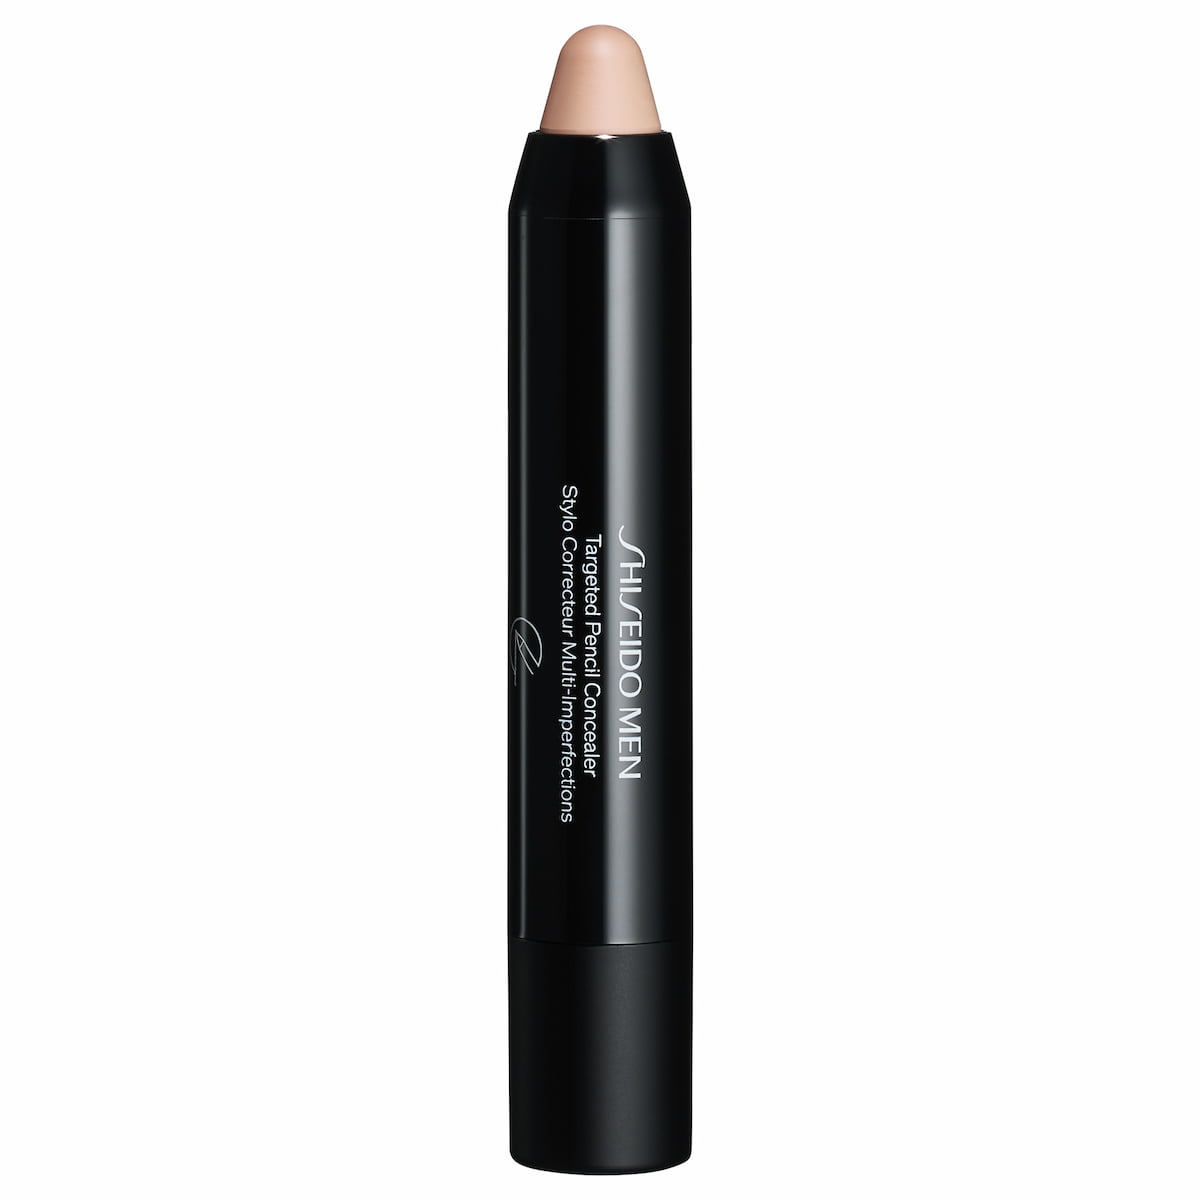 Shiseido Men - Stylo Correcteur Multi-Imperfections